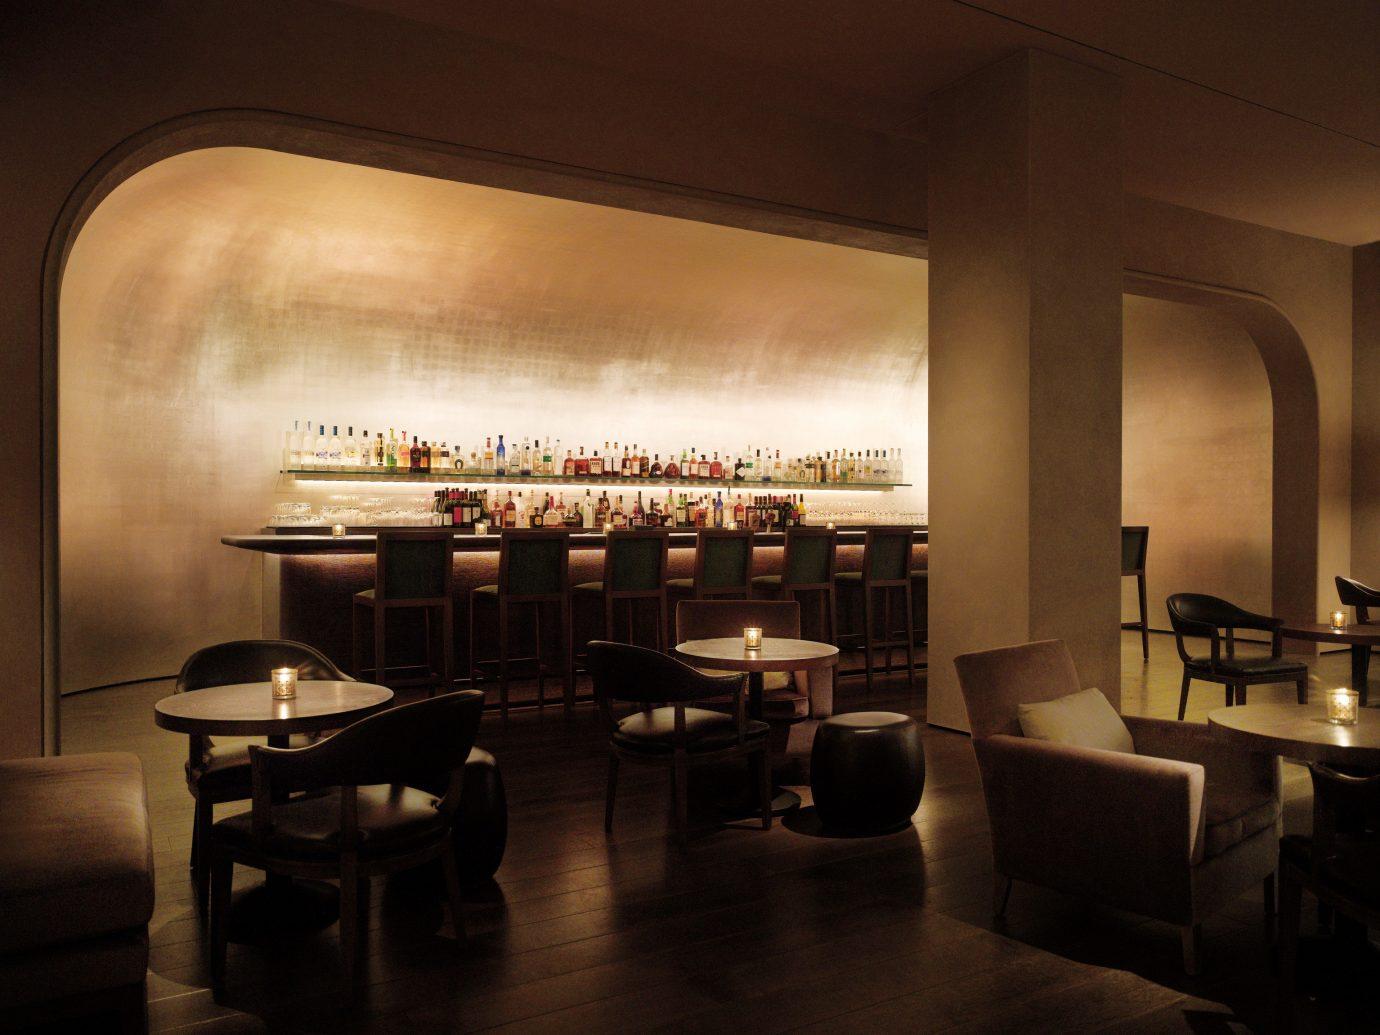 Food + Drink Hotels indoor wall floor table room ceiling Living restaurant interior design lighting furniture shape Bar area